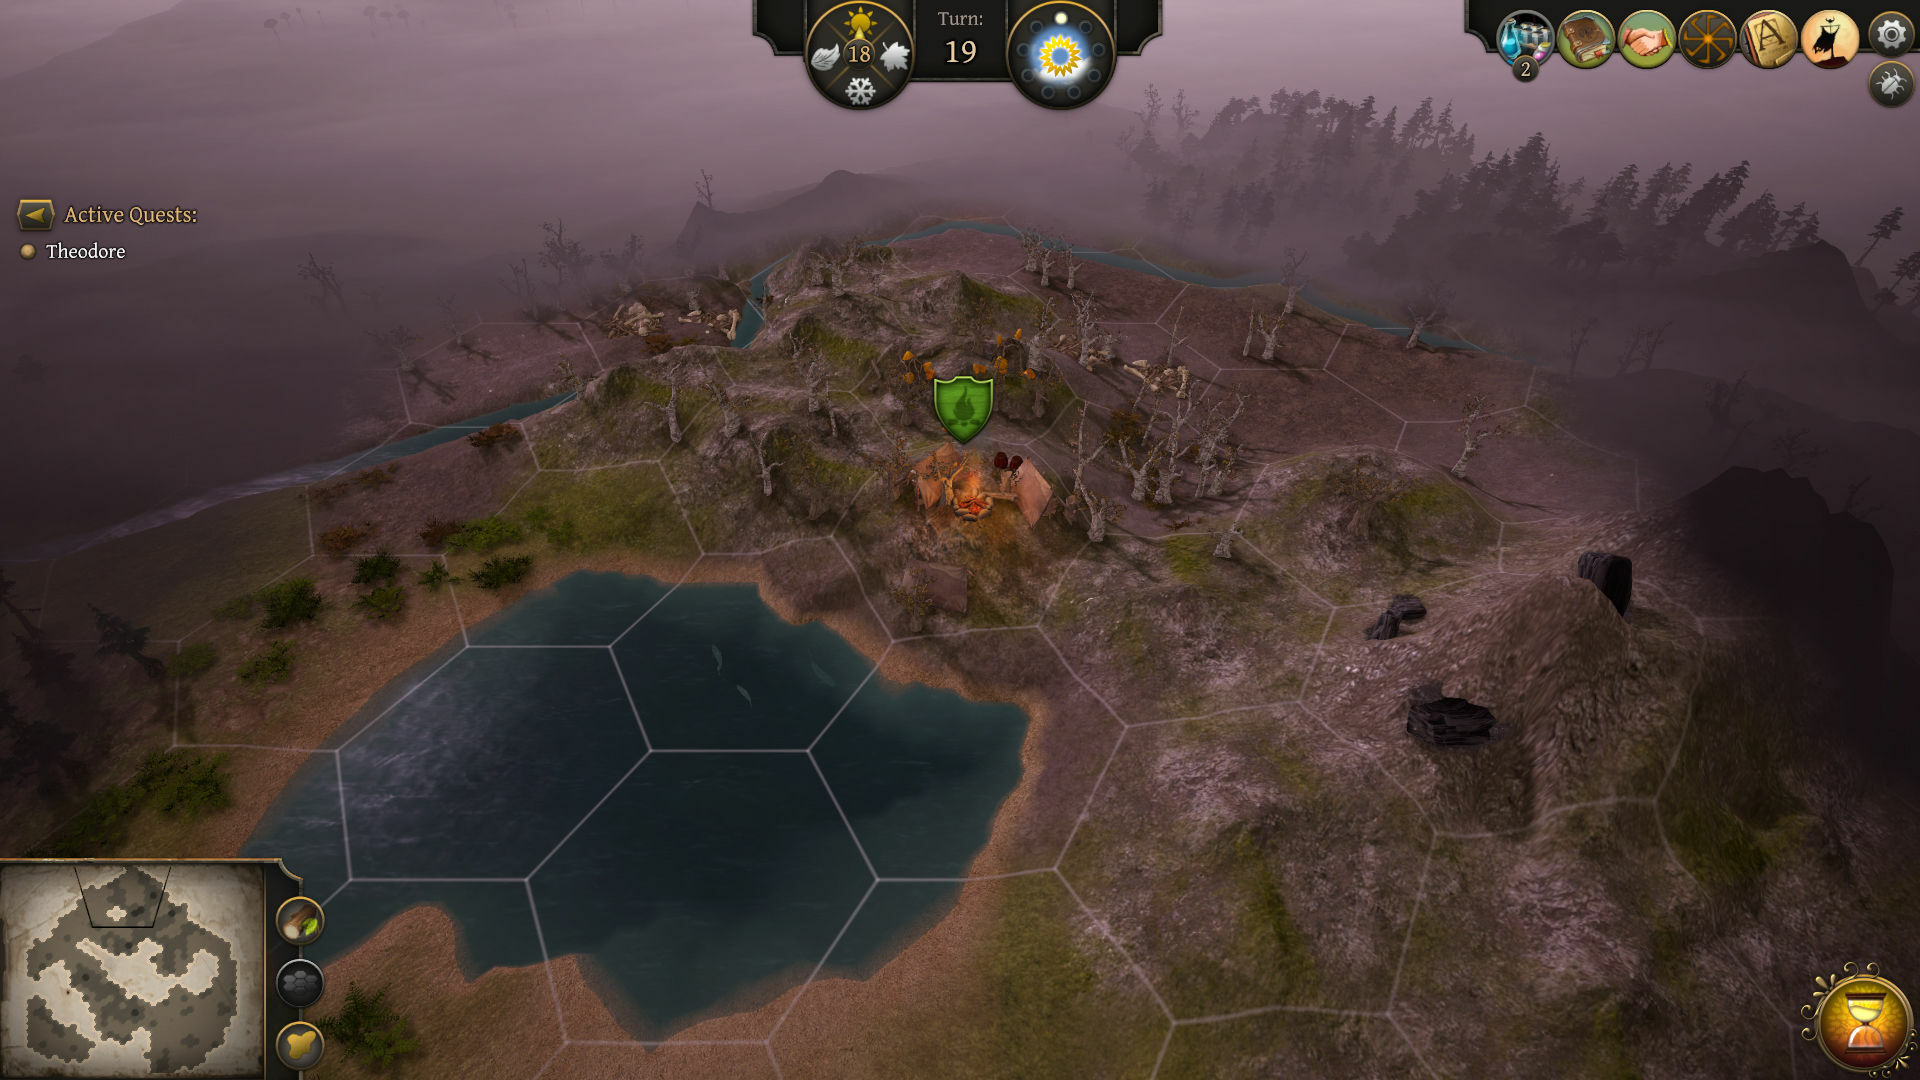 Thea 2: The Shattering screenshot 2